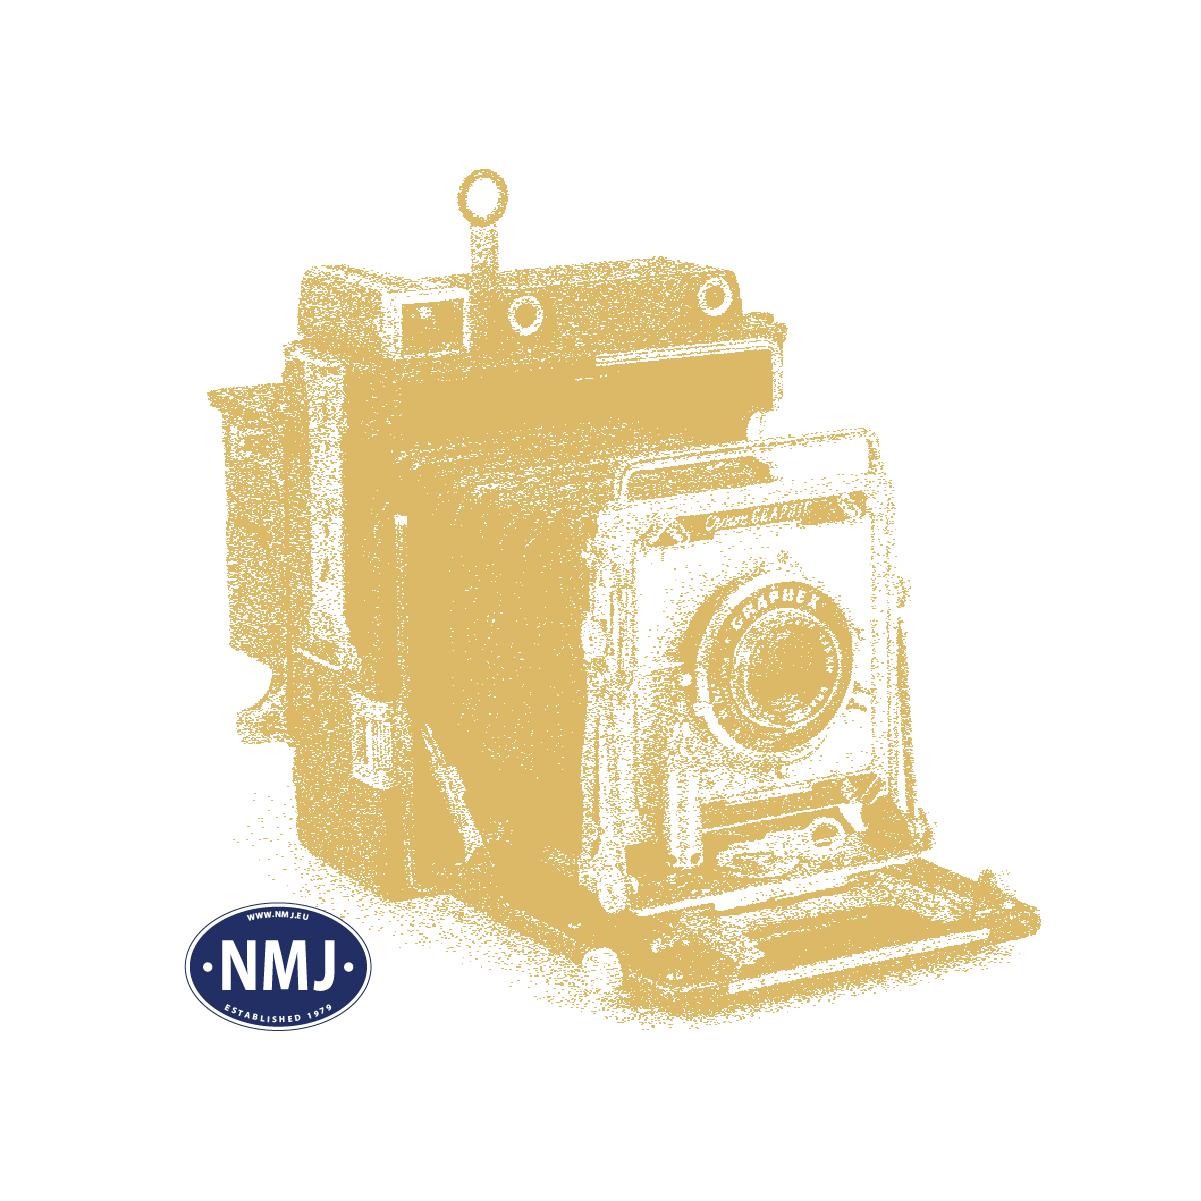 NMJT90206 - NMJ Topline MAV M61.003, DC